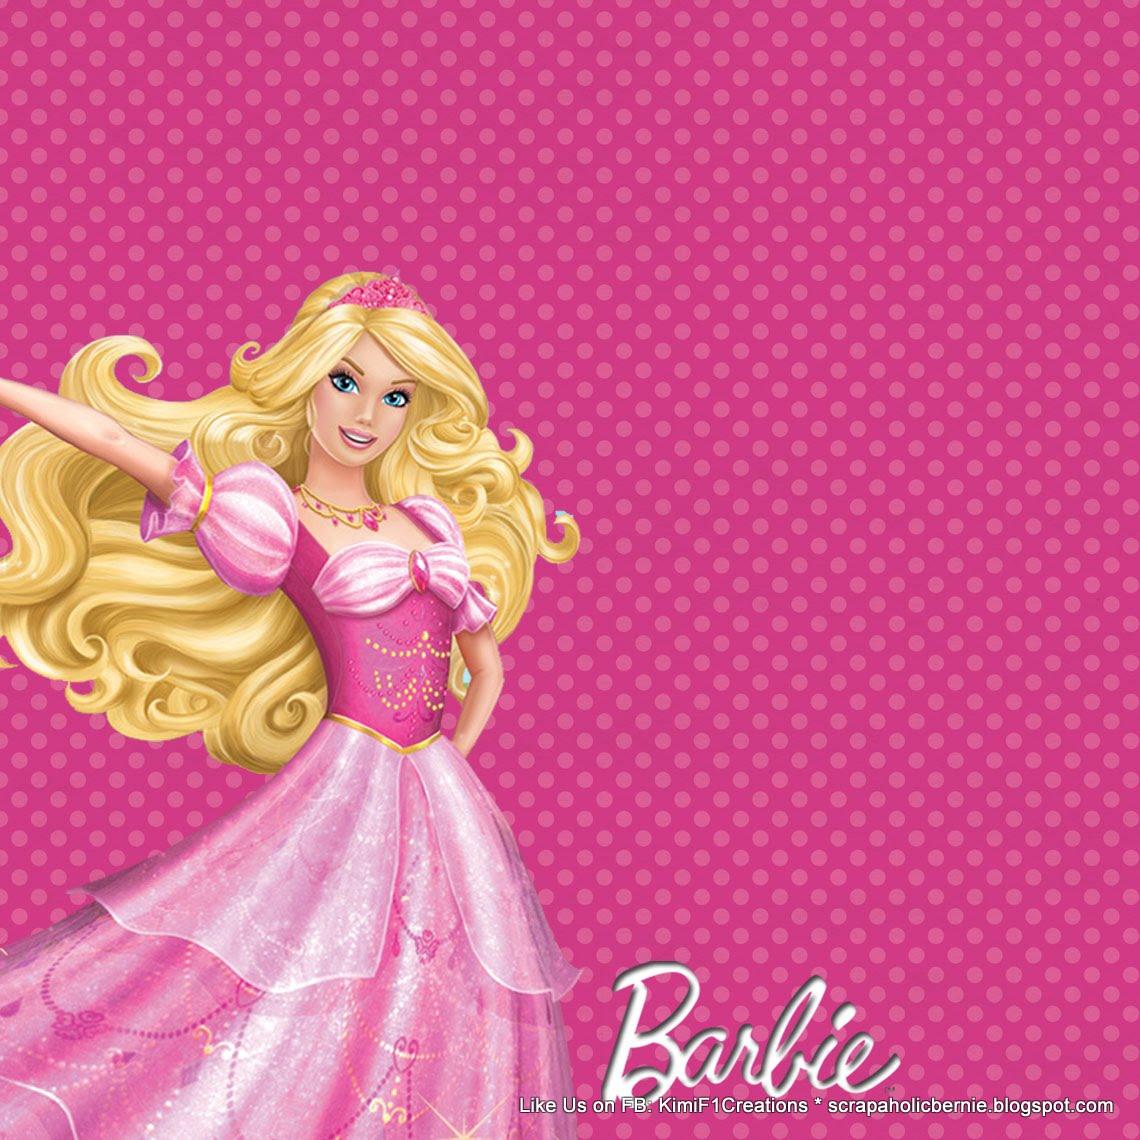 Barbie clipart tarpaulin On plumegiant you own Barbie